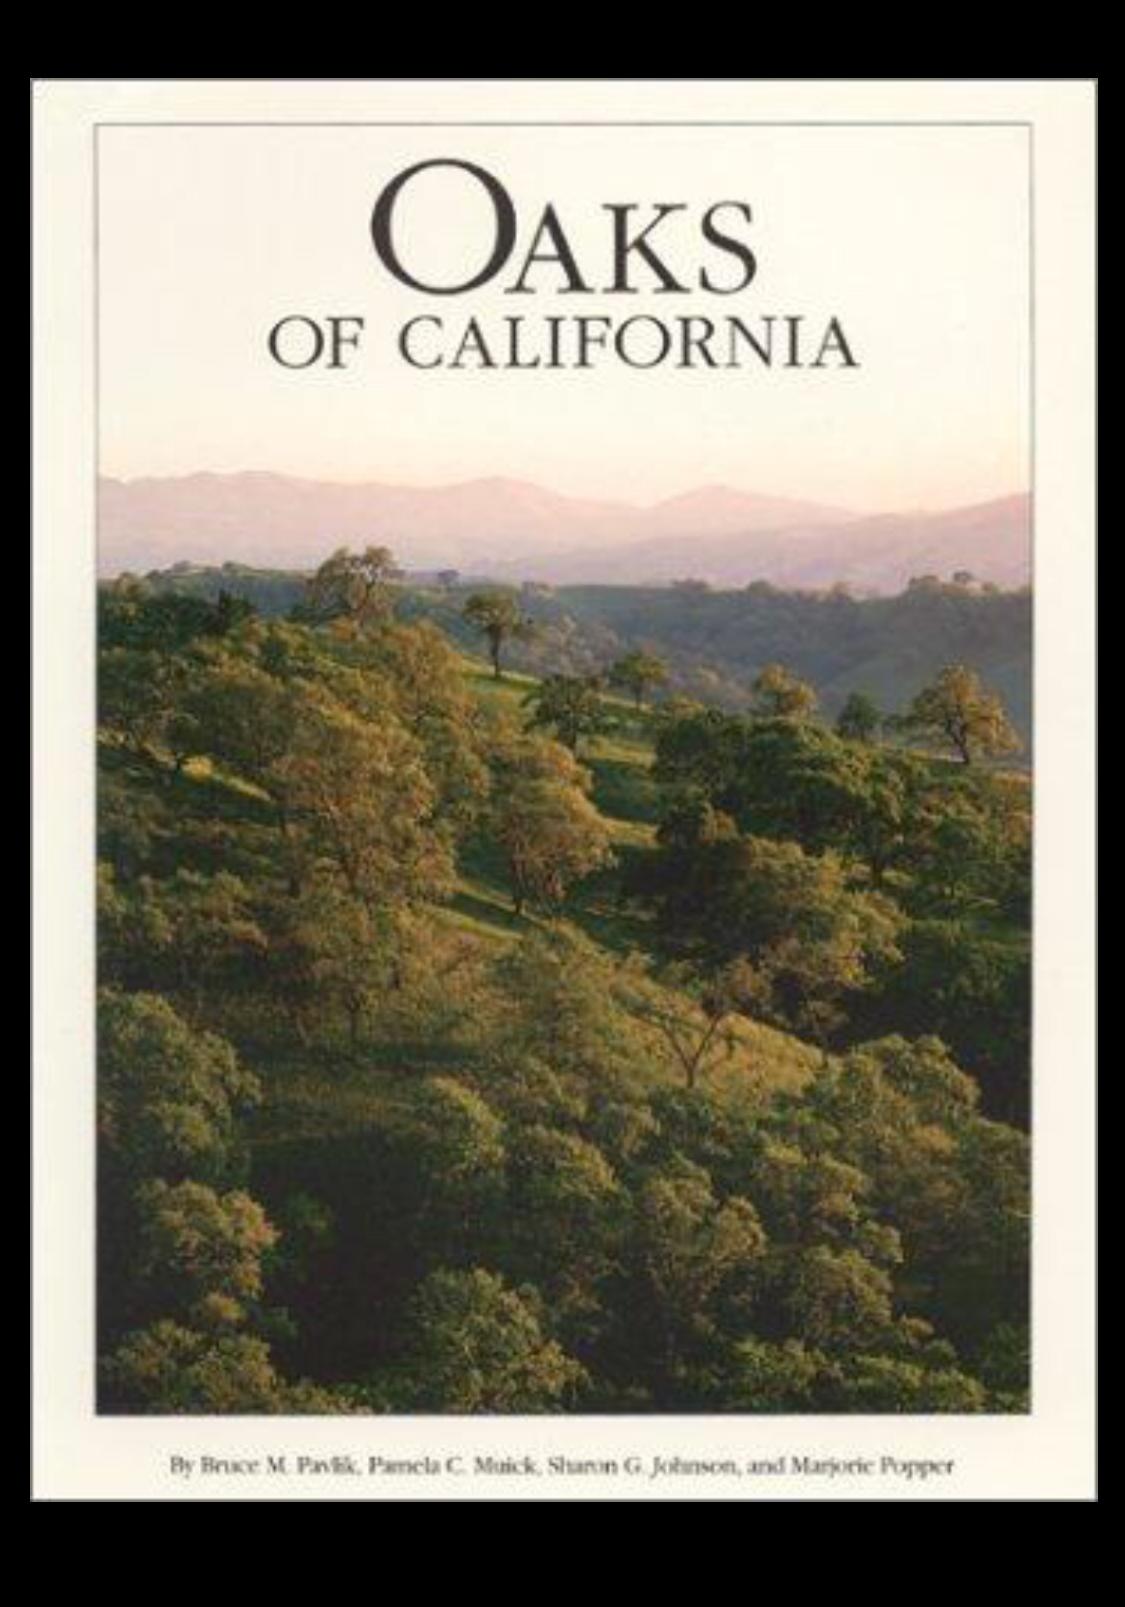 Oaks of California- $29.95